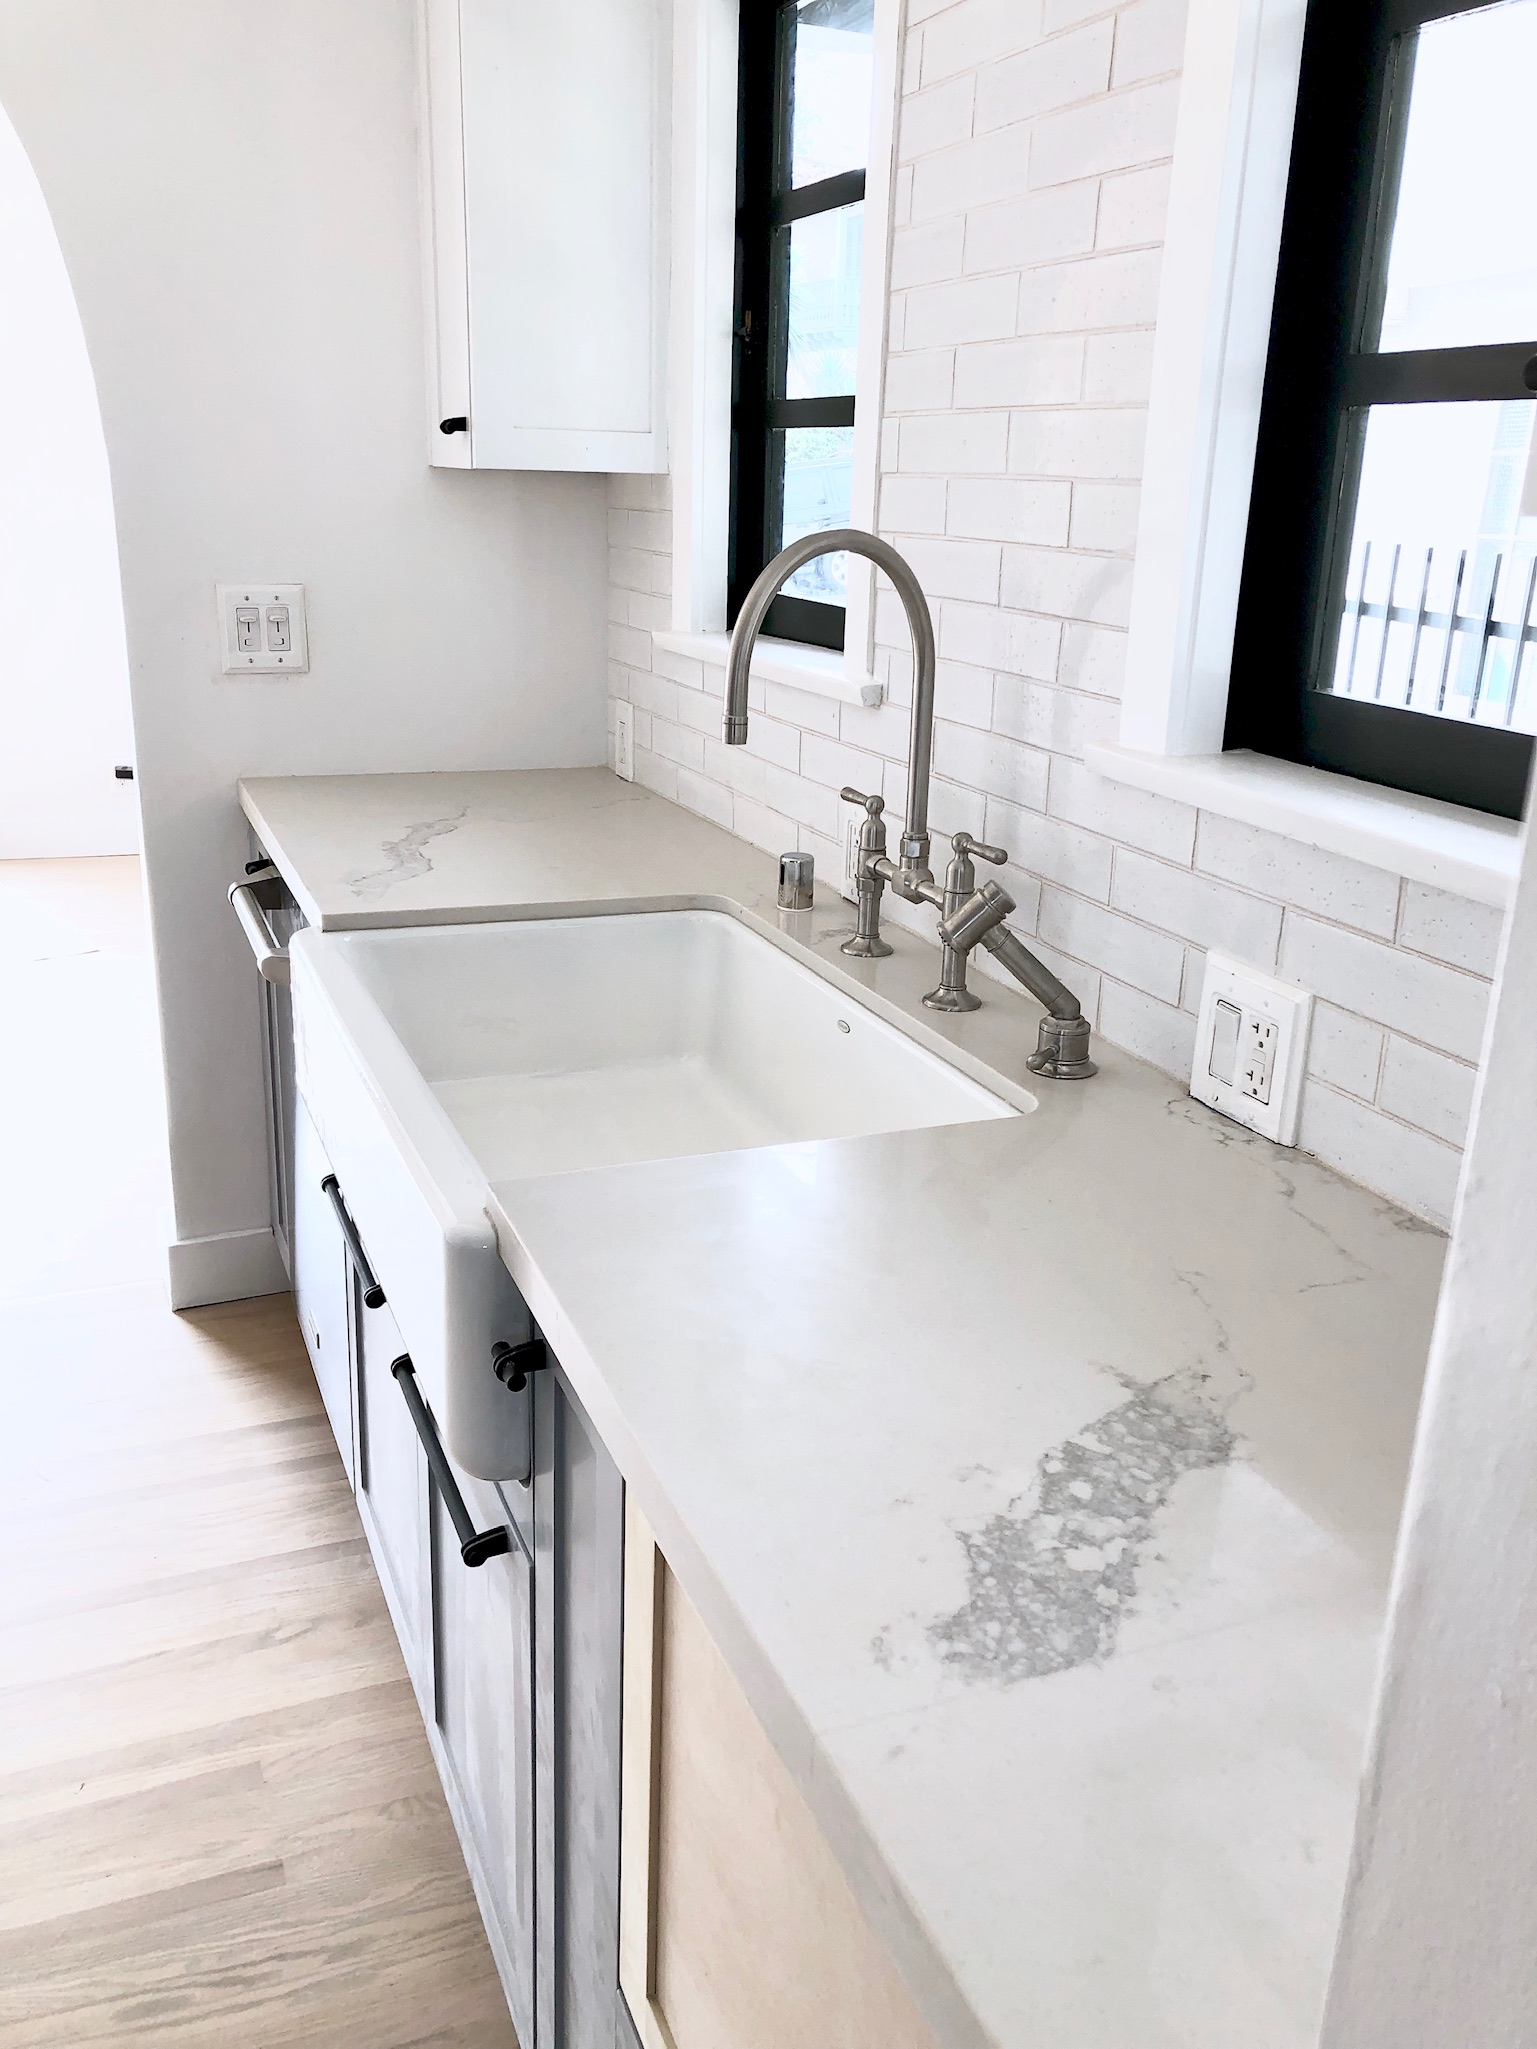 Kohler Kitchen Sink Cococozy Design House Cococozy